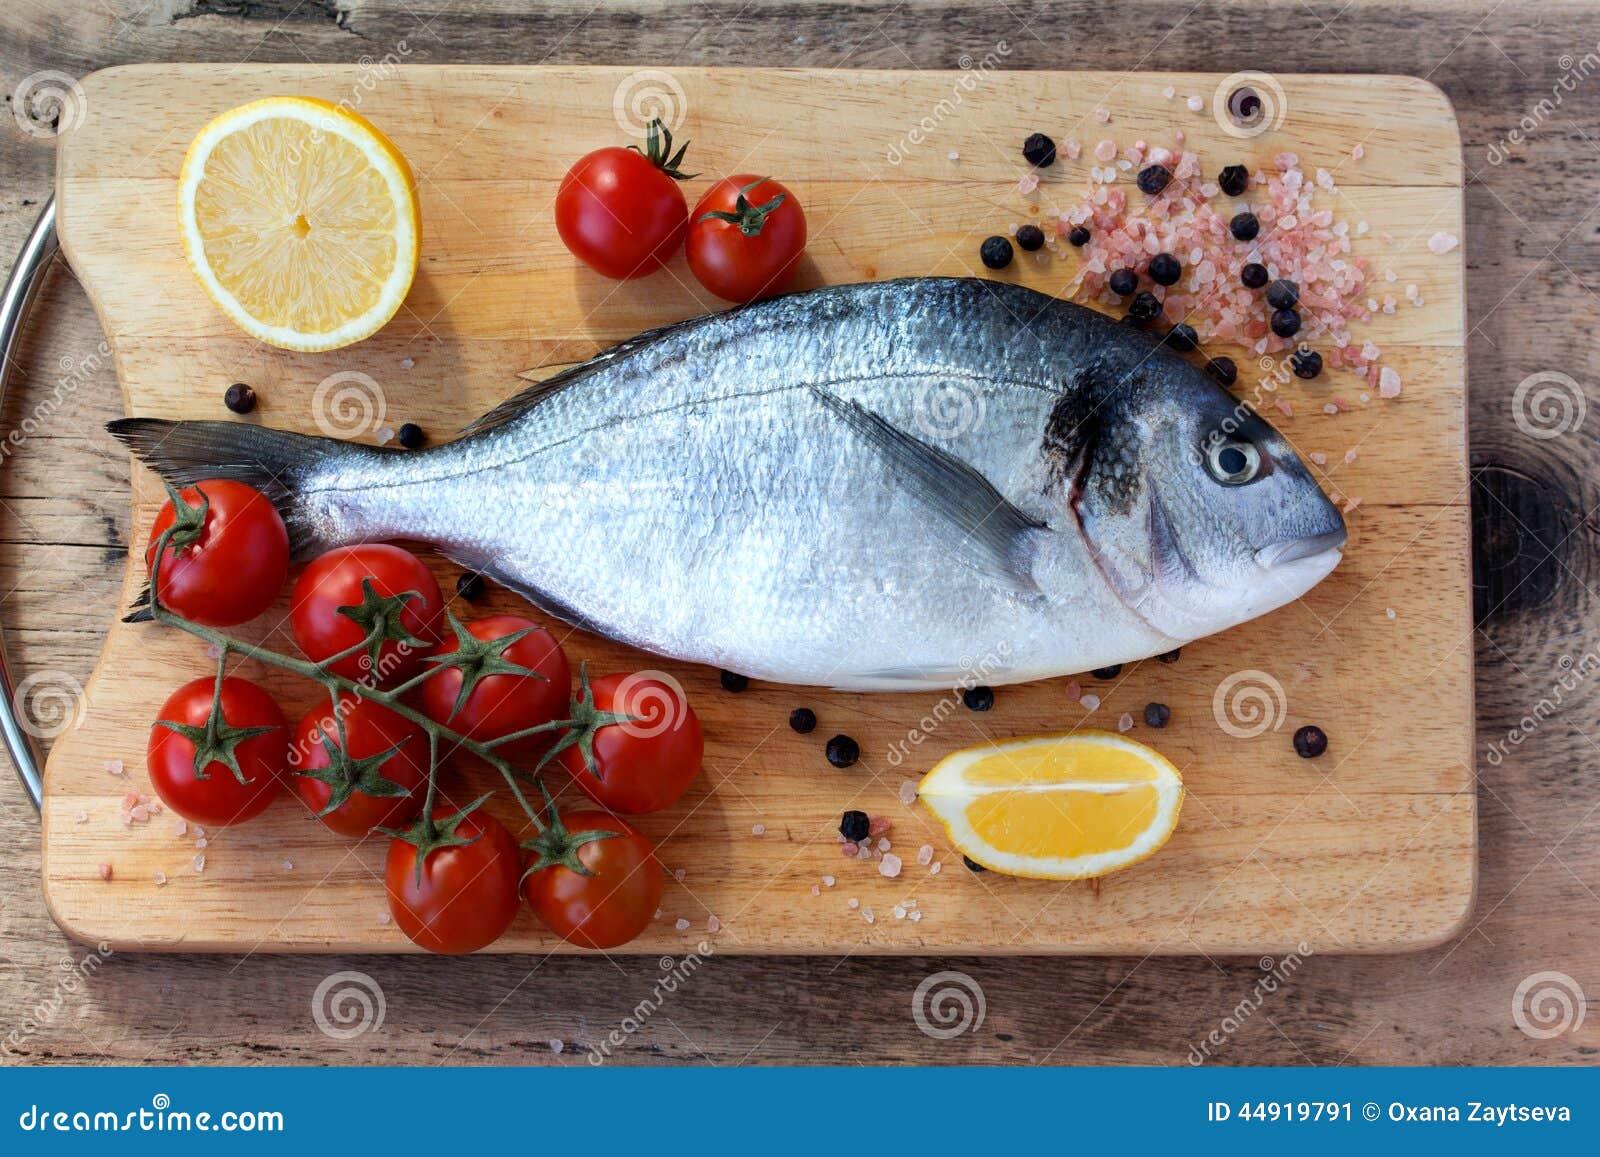 Two fresh gilt head bream fish on cutting board stock for Fish cutting board